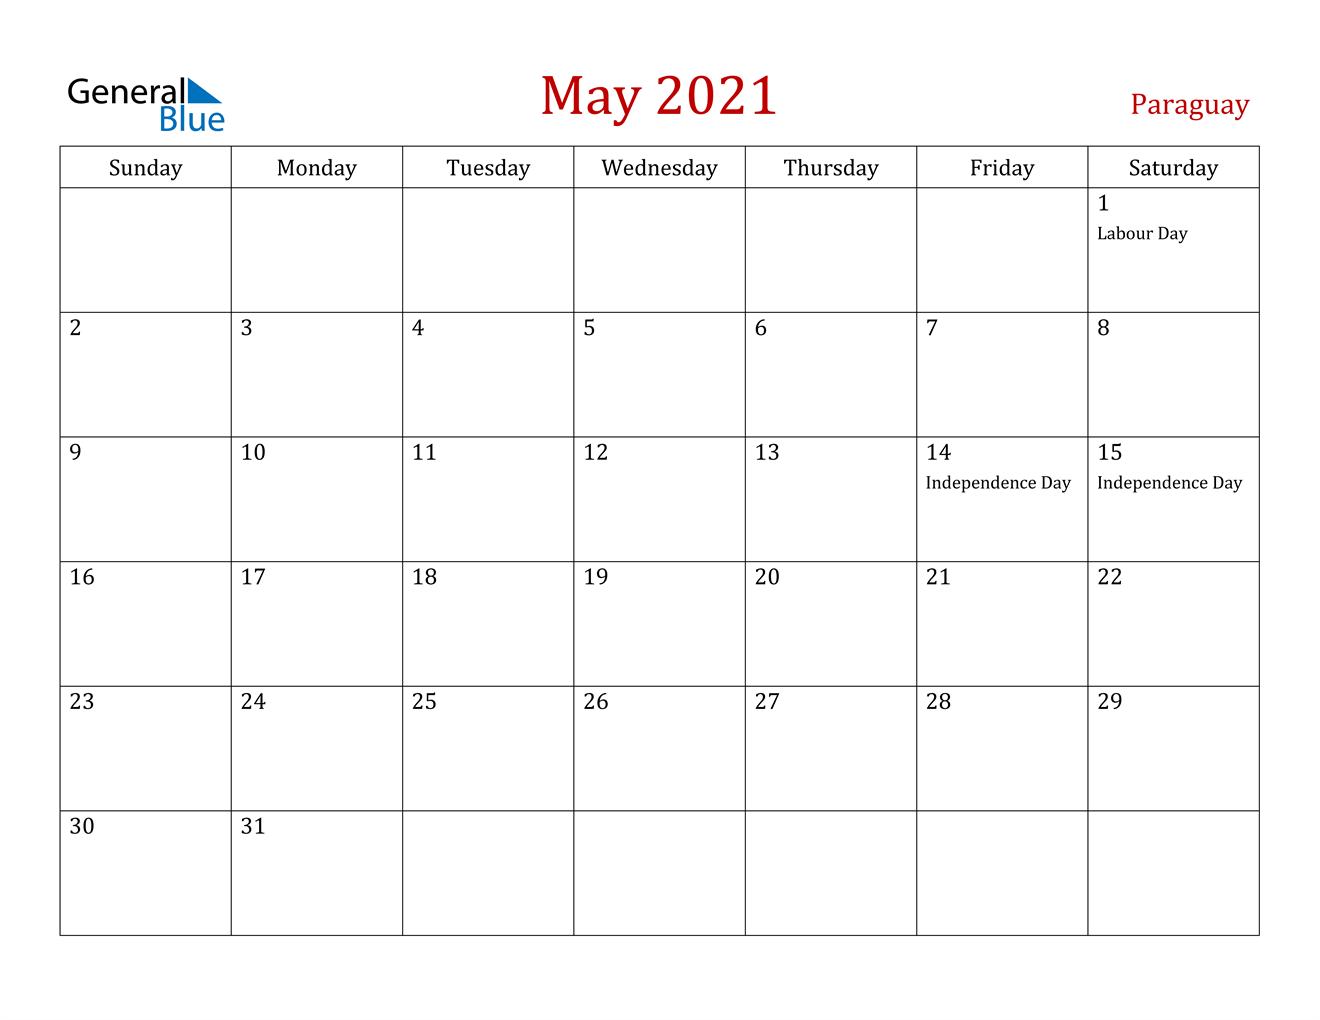 May 2021 Calendar - Paraguay